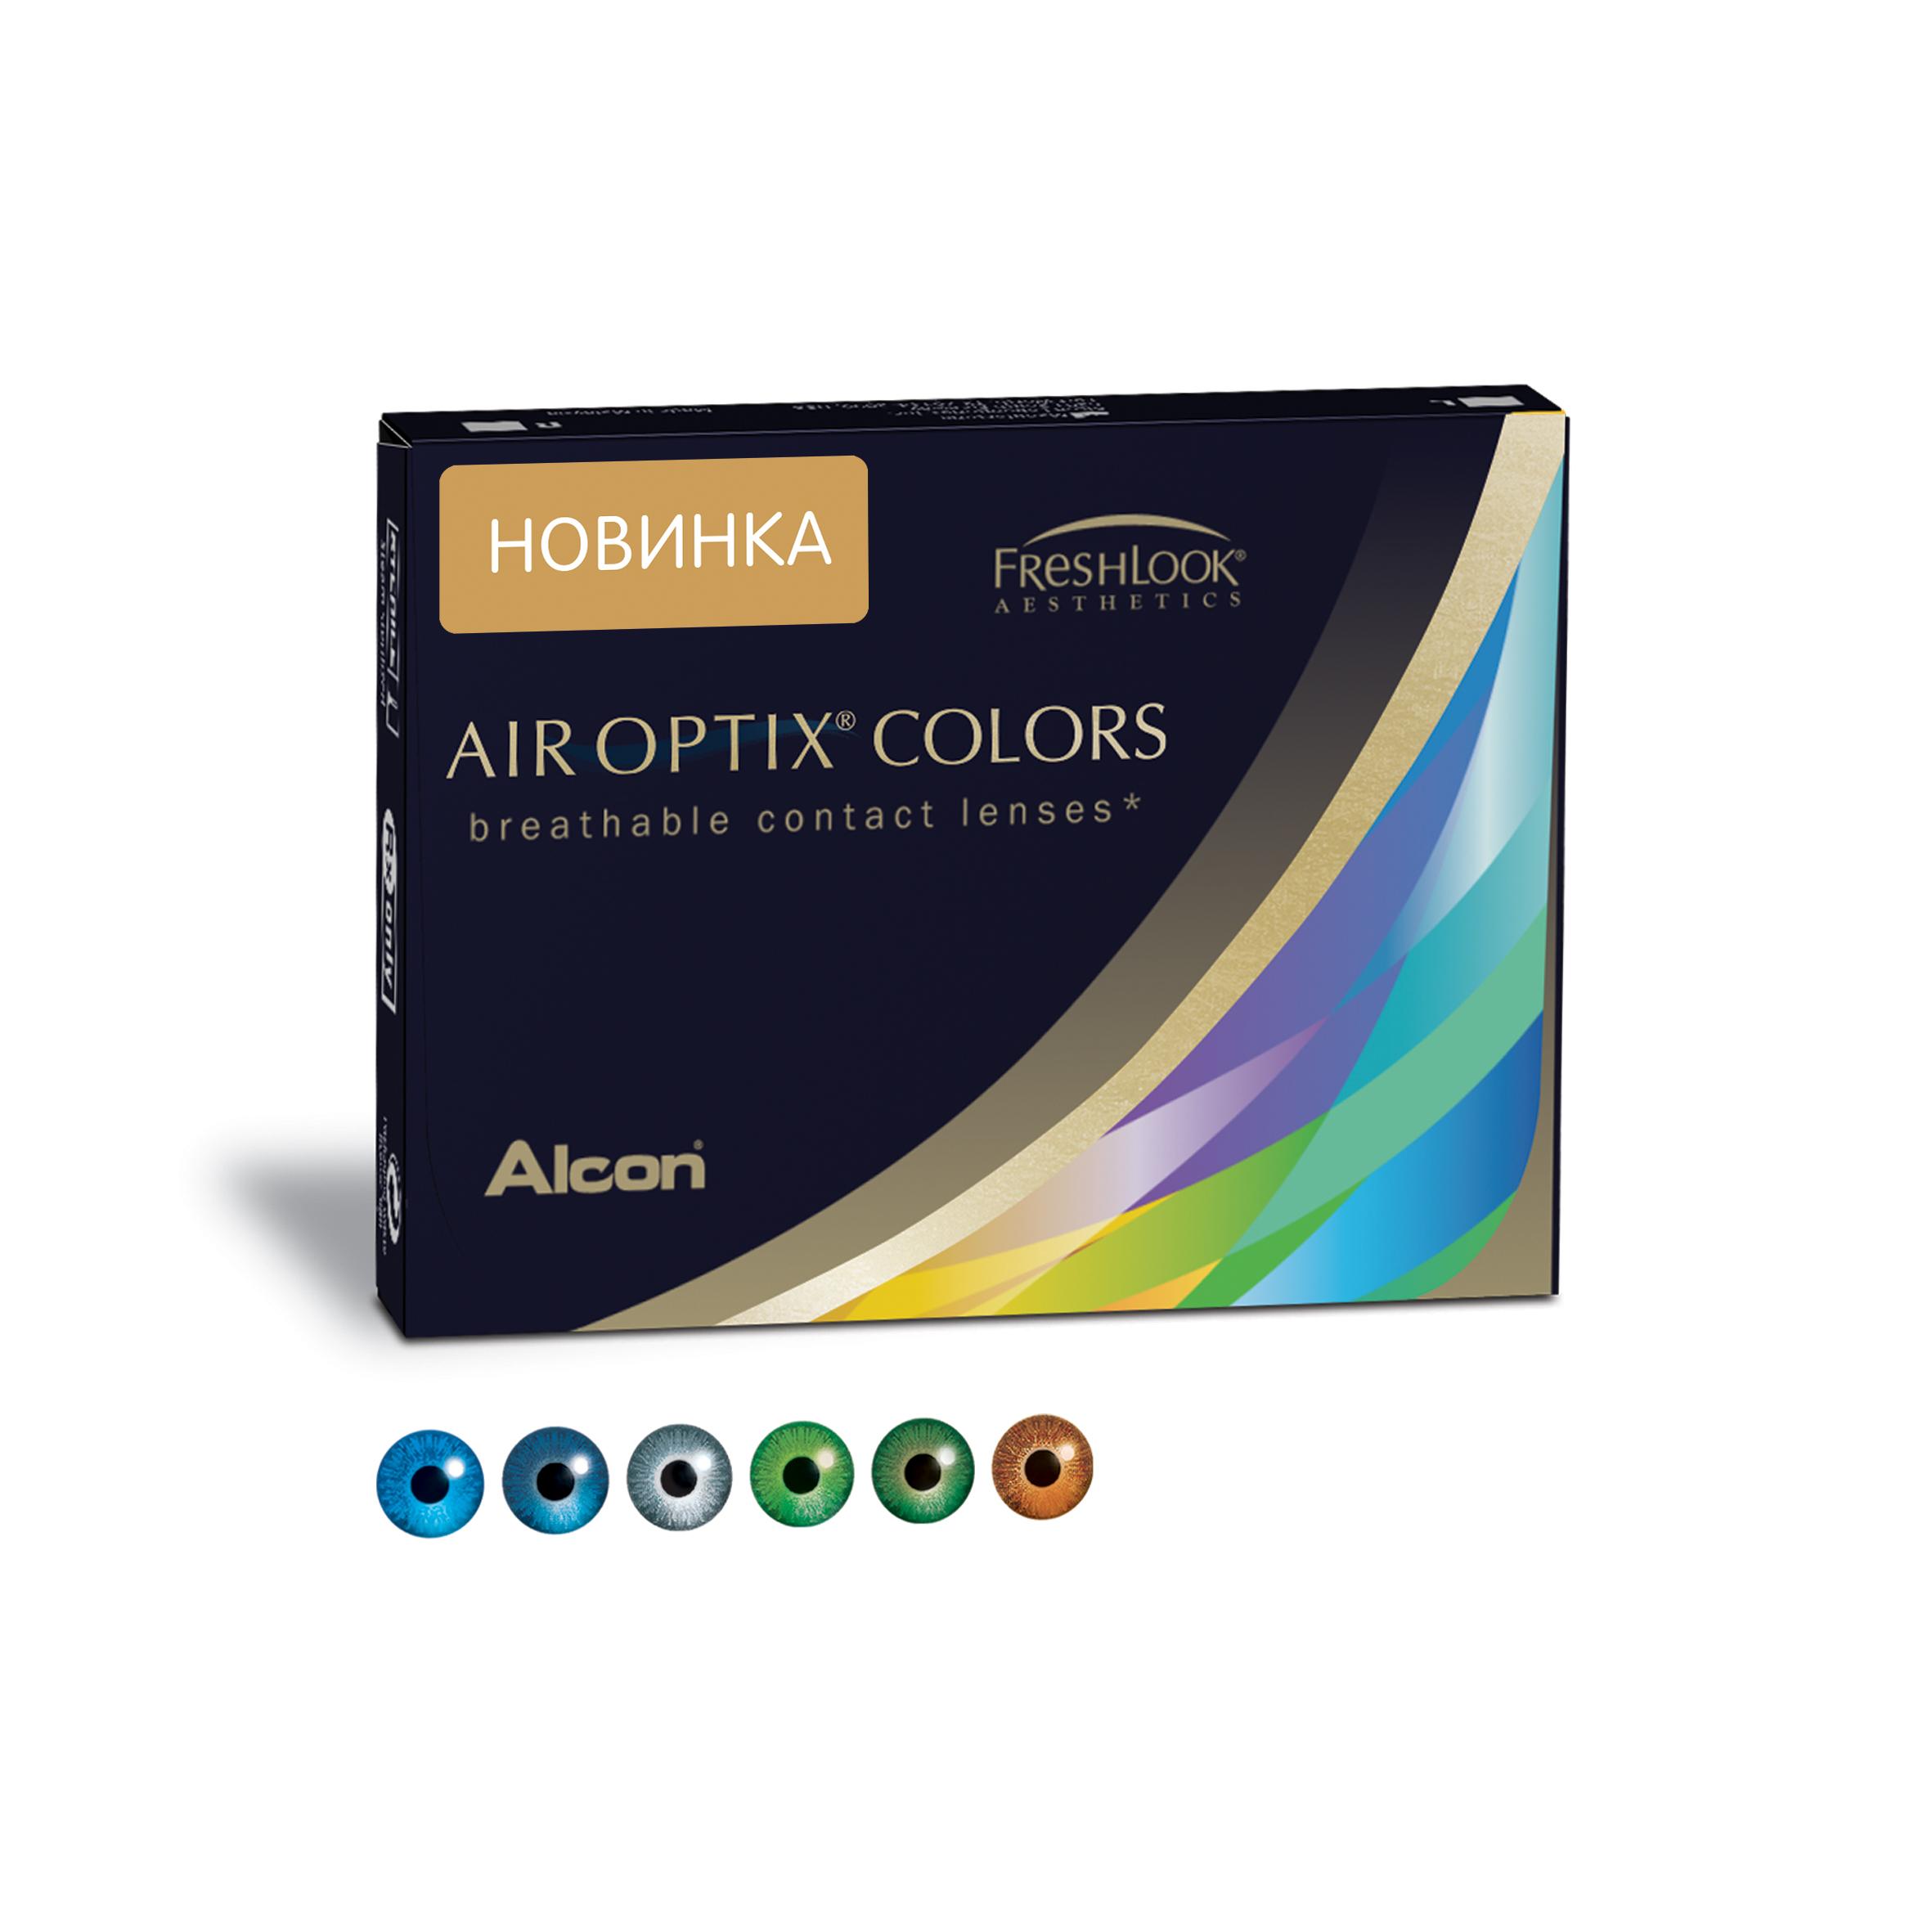 Аlcon контактные линзы Air Optix Colors 2 шт -5.00 Honey31746271Мягкие контактные линзы